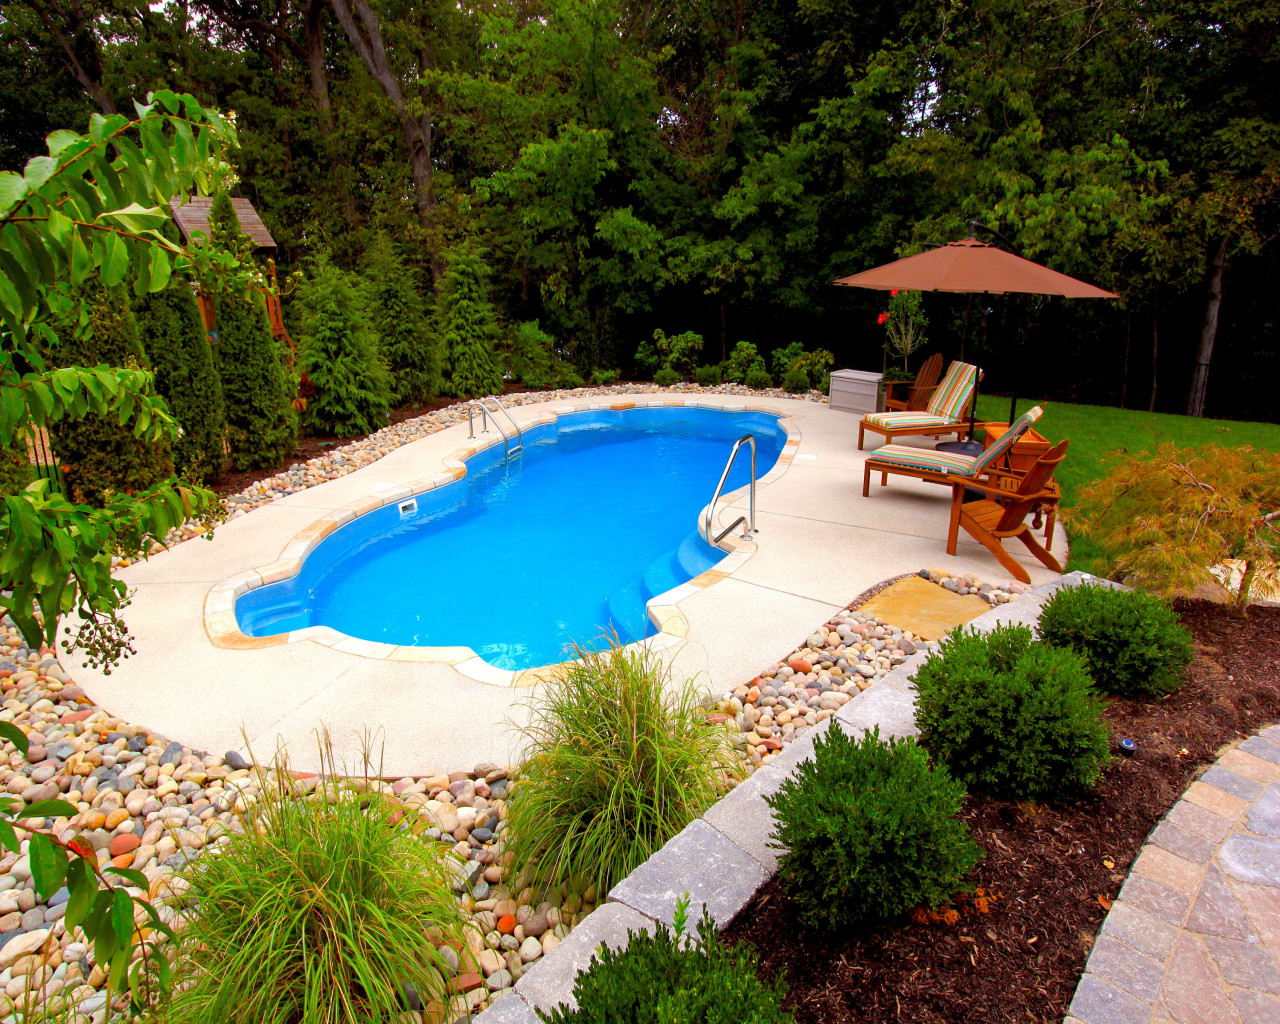 14 - Utopia Pool